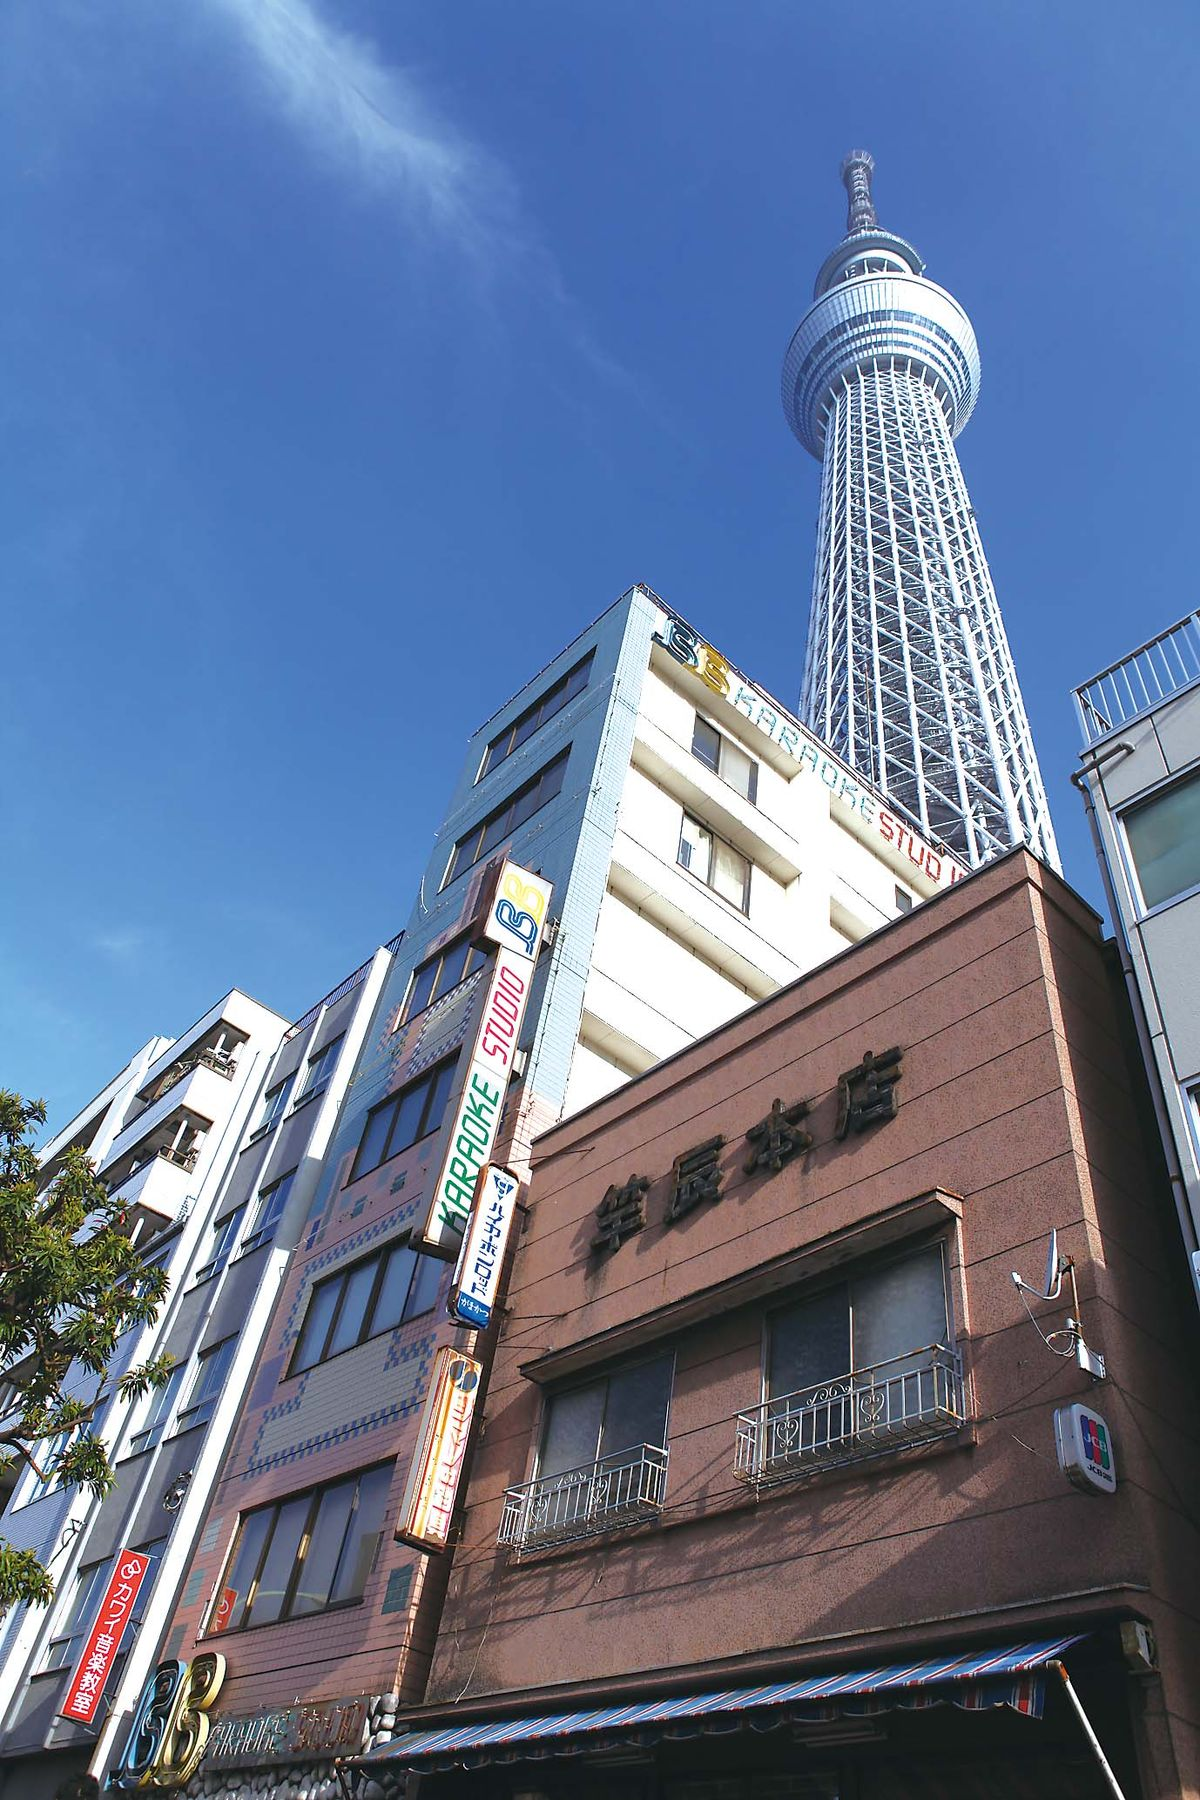 038-041mihobuna-mankai_cs6 (3)